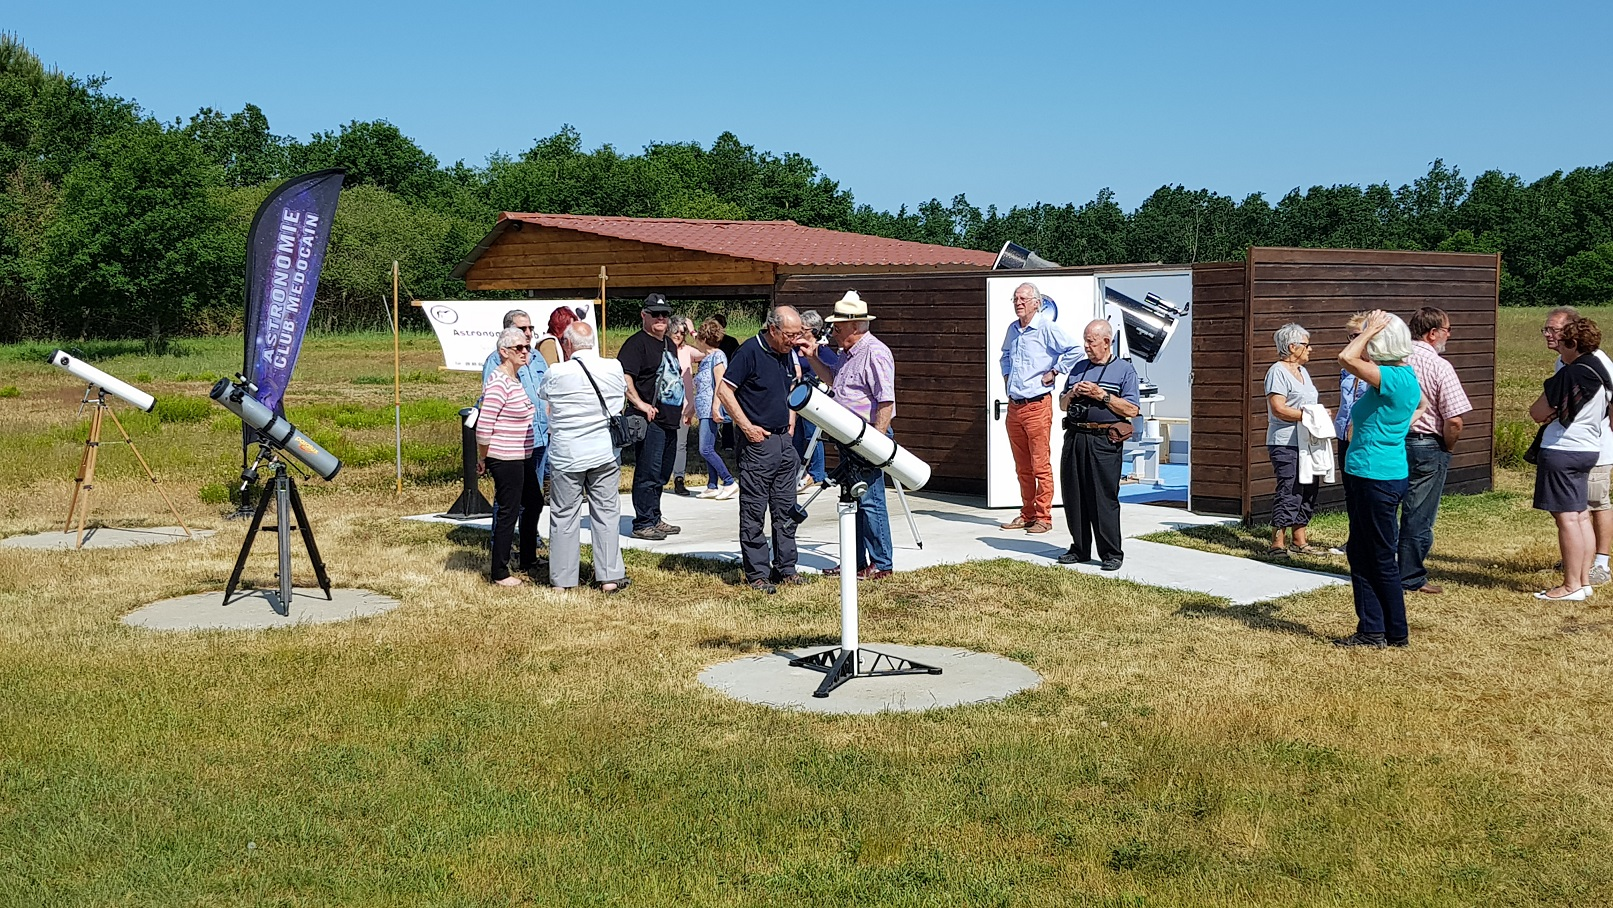 inauguration de l'observatoire 26 mai 2018